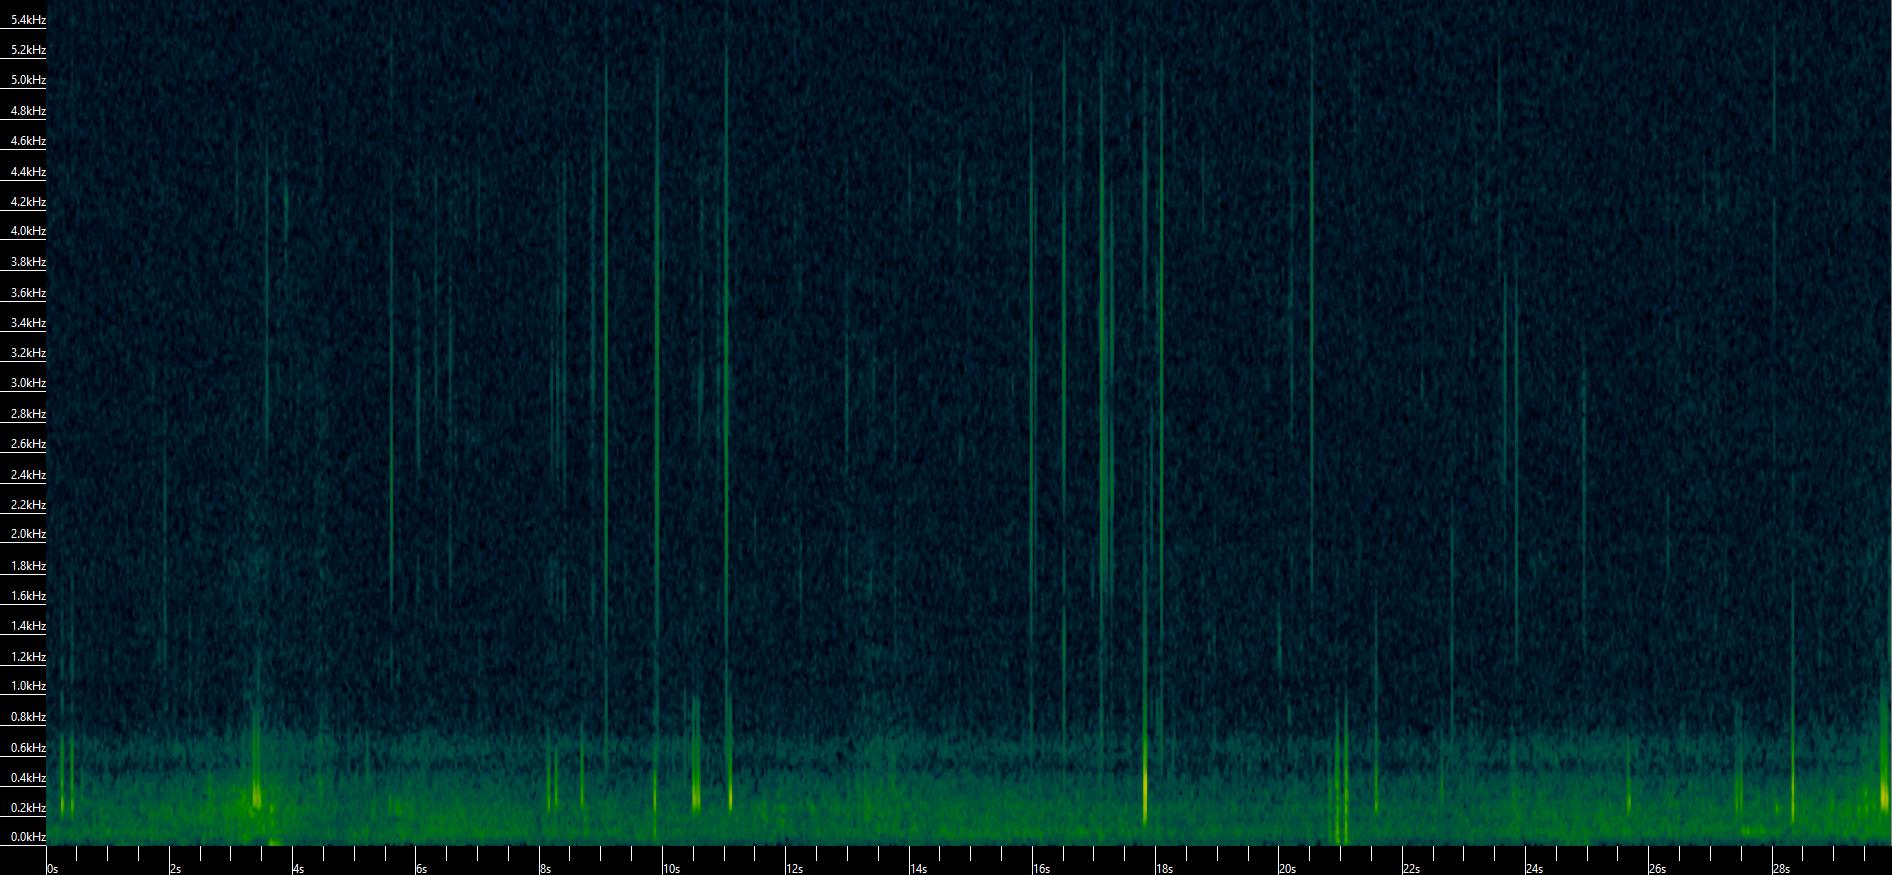 Spectrogram Marine Rock Pool Grunters